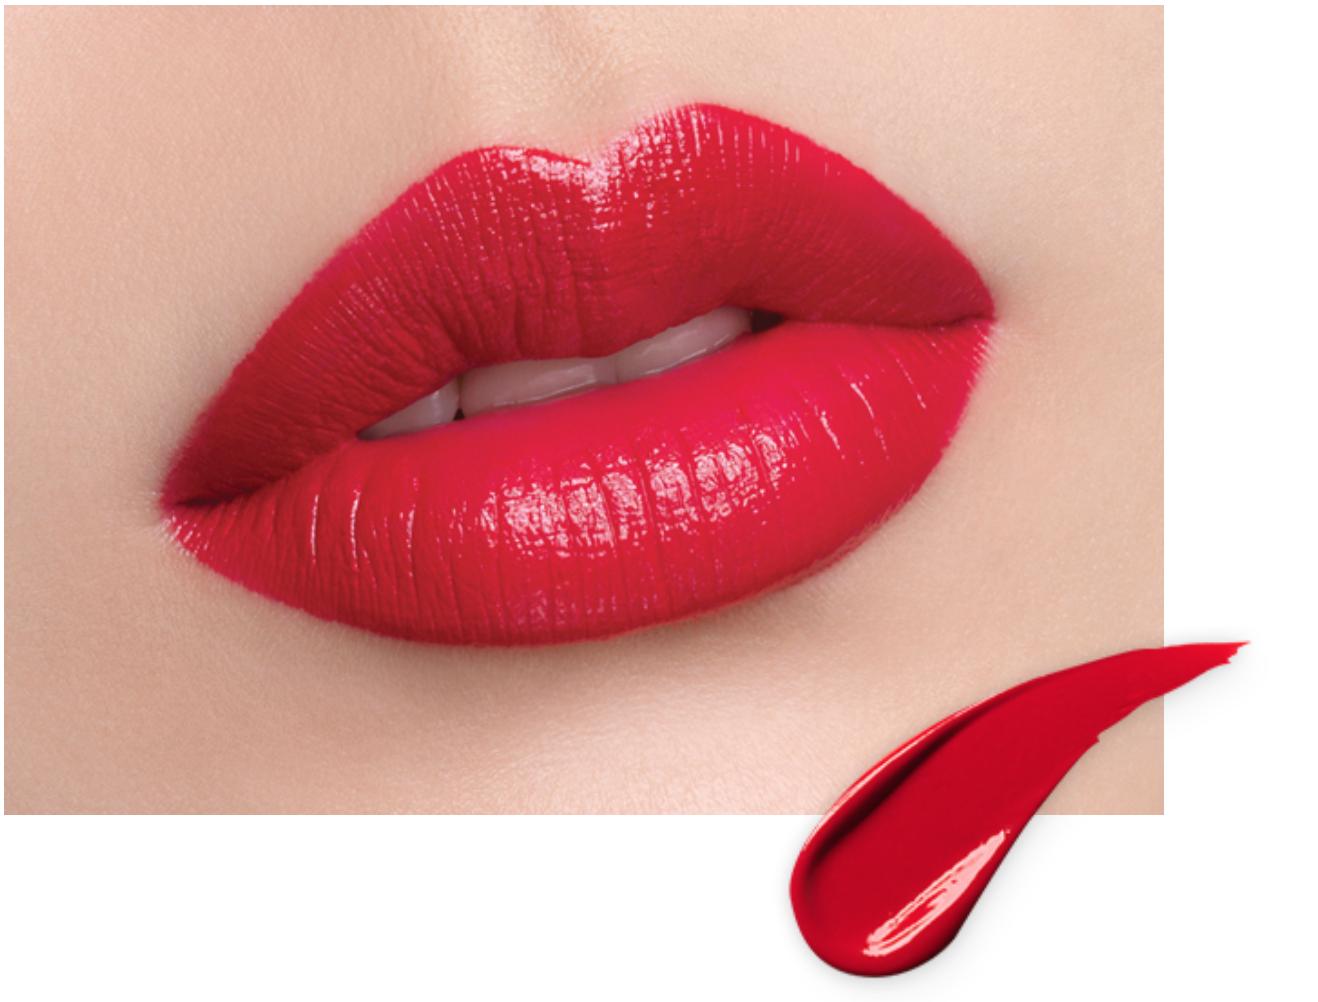 laneige-silk-intense-lipstick-335.png